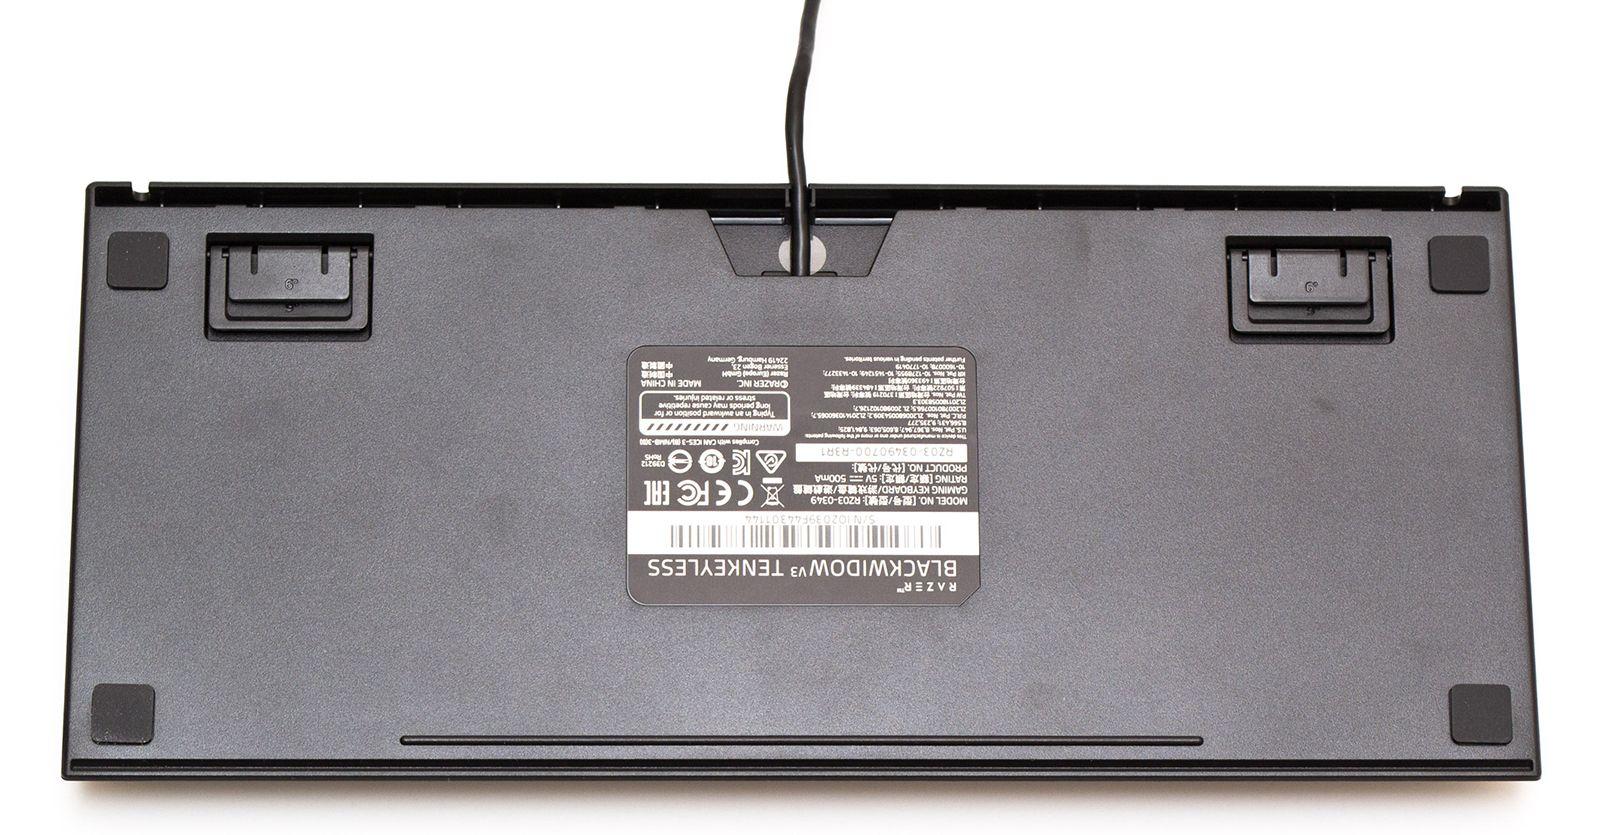 Клавиатура Razer BlackWidow V3 Tenkeyless. Фото 14